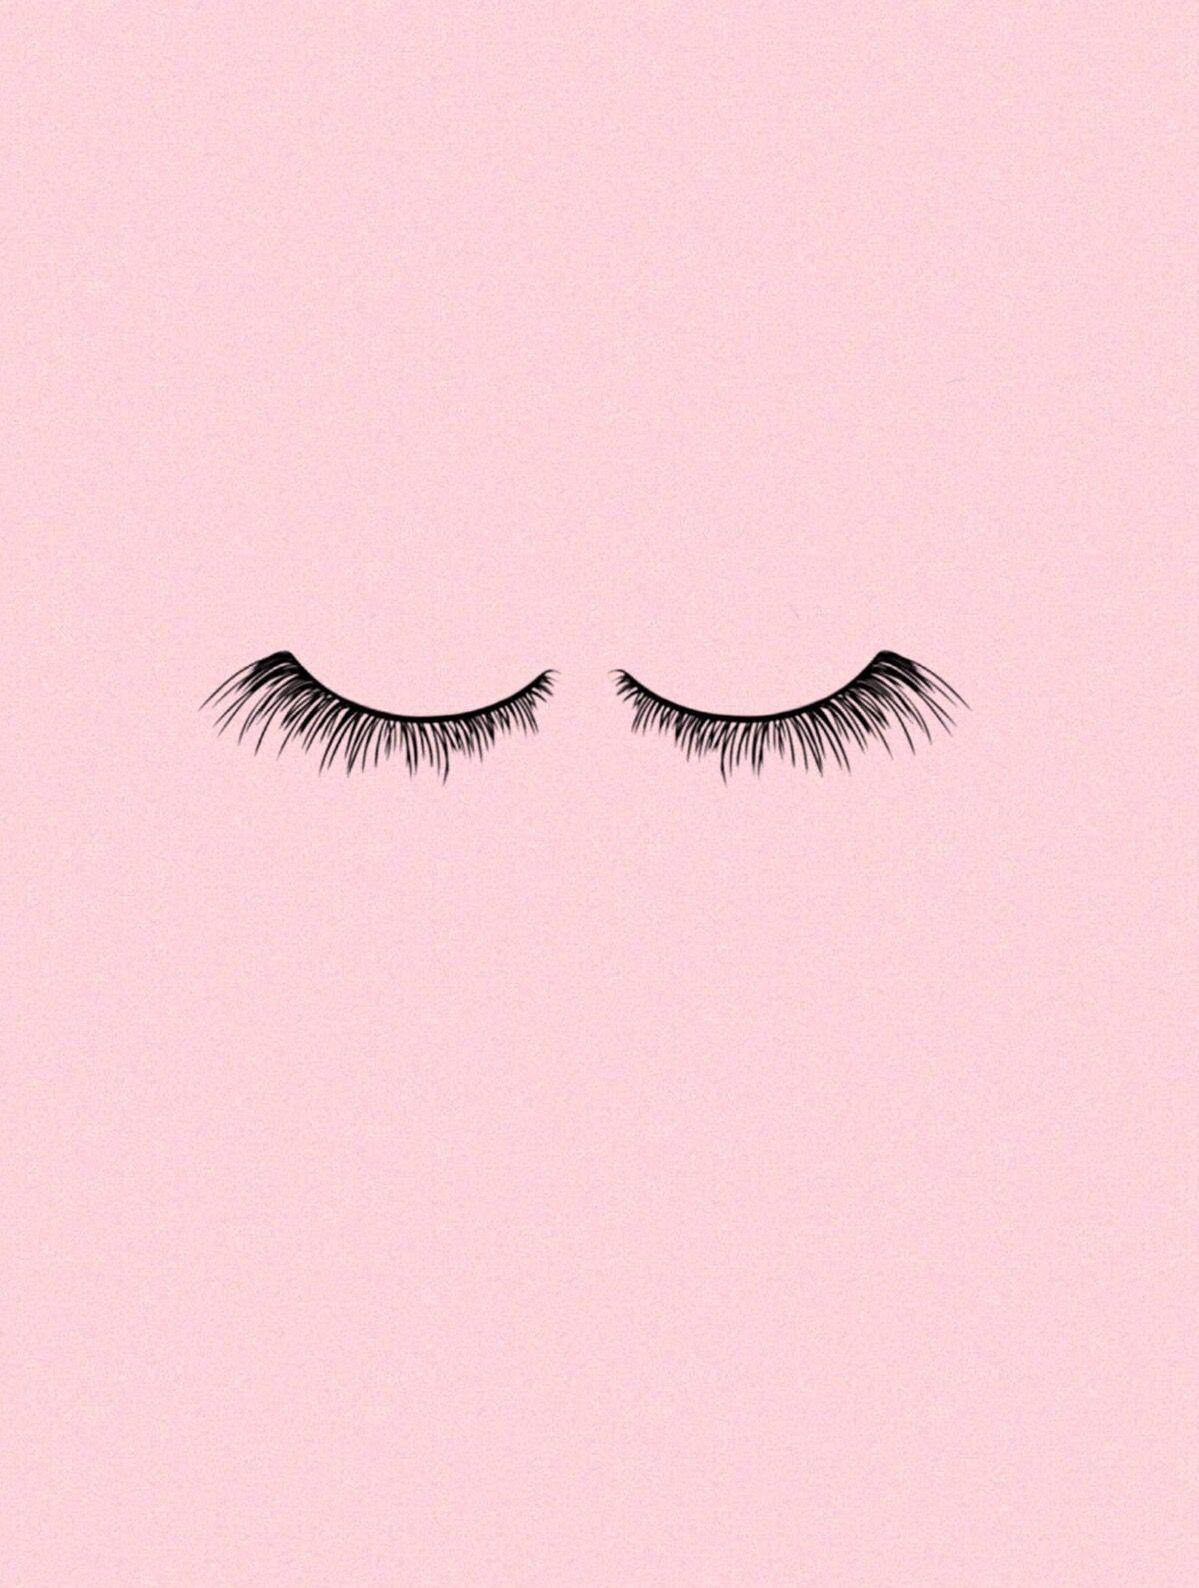 Aesthetic Baby Pink Background : aesthetic, background, Aesthetic, Wallpapers, Backgrounds, WallpaperAccess